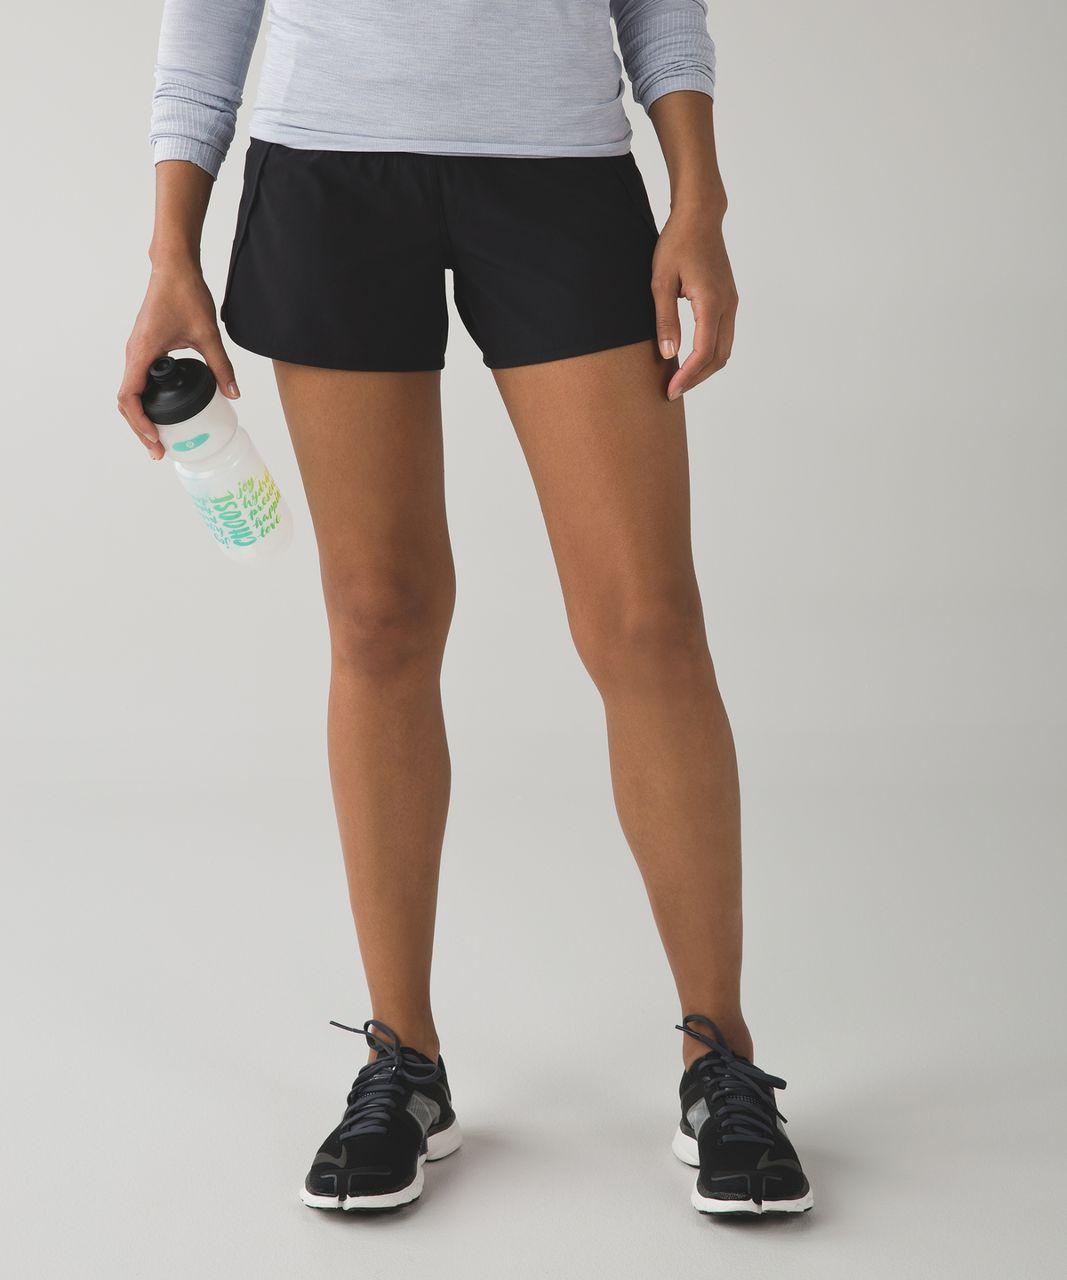 Lululemon Purist Cycling Water Bottle *26 oz - Choose Hydration Purist